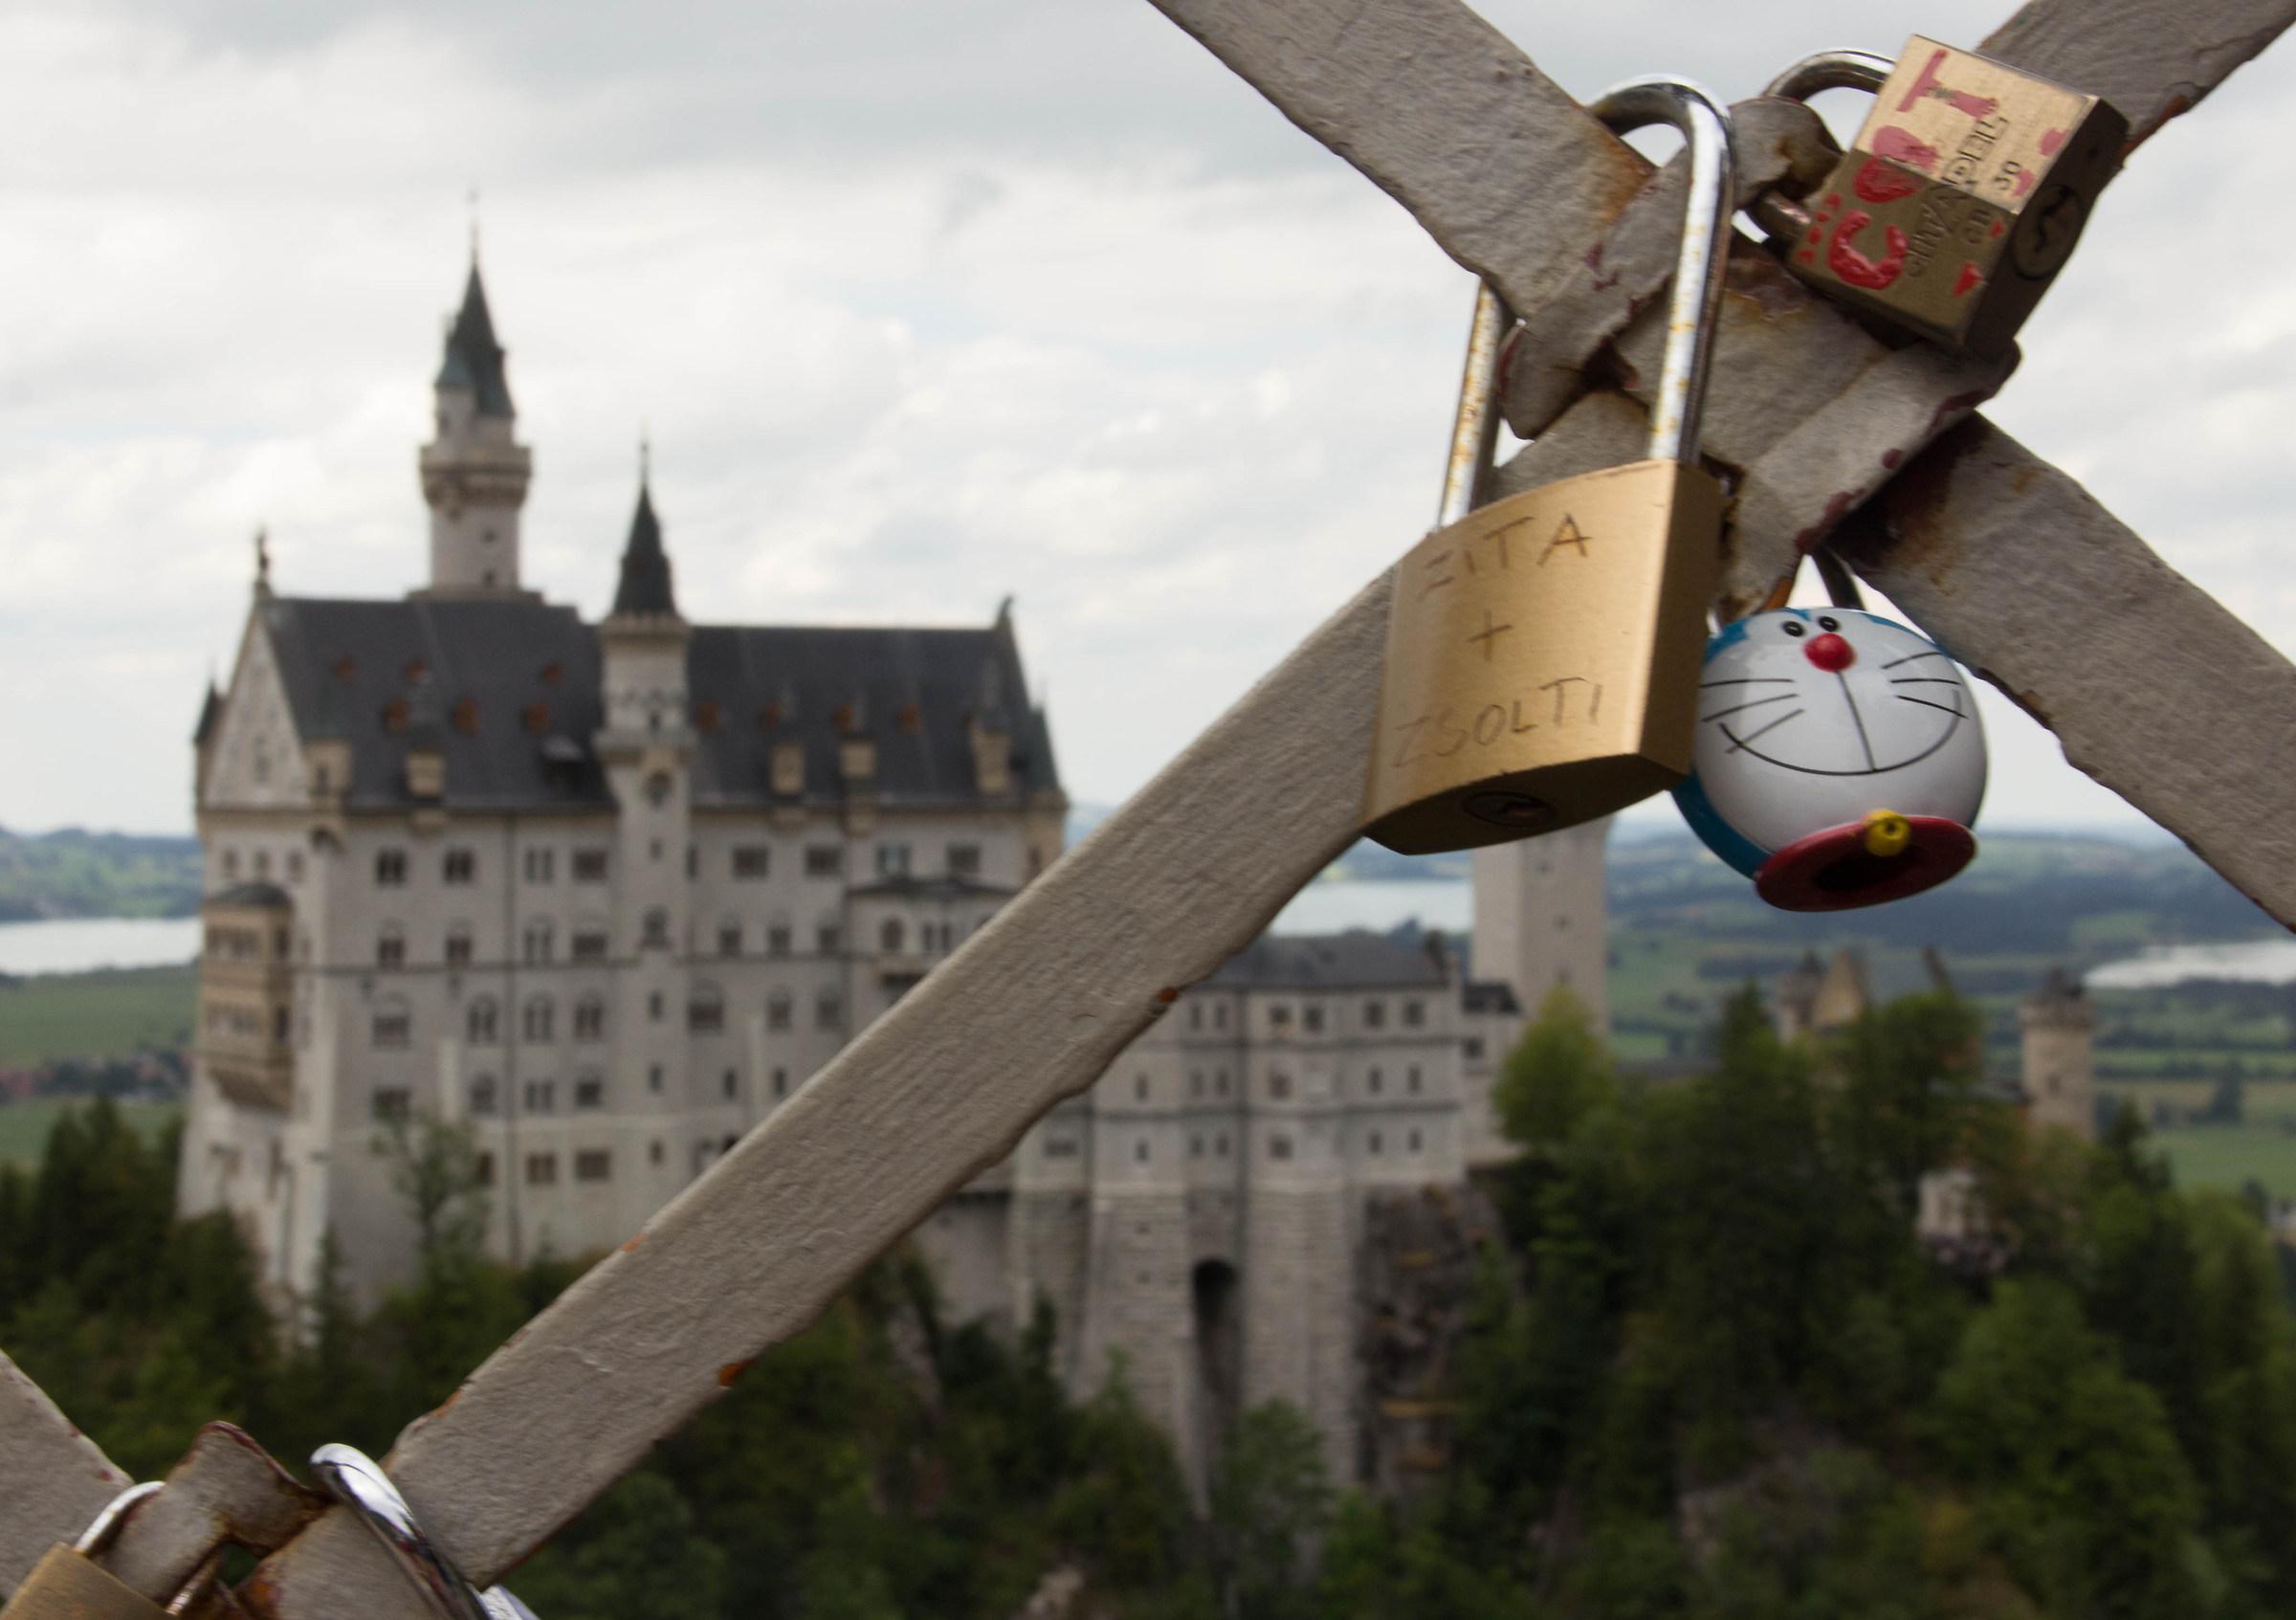 Doraemon in visita al castello di Neuschwanstein...